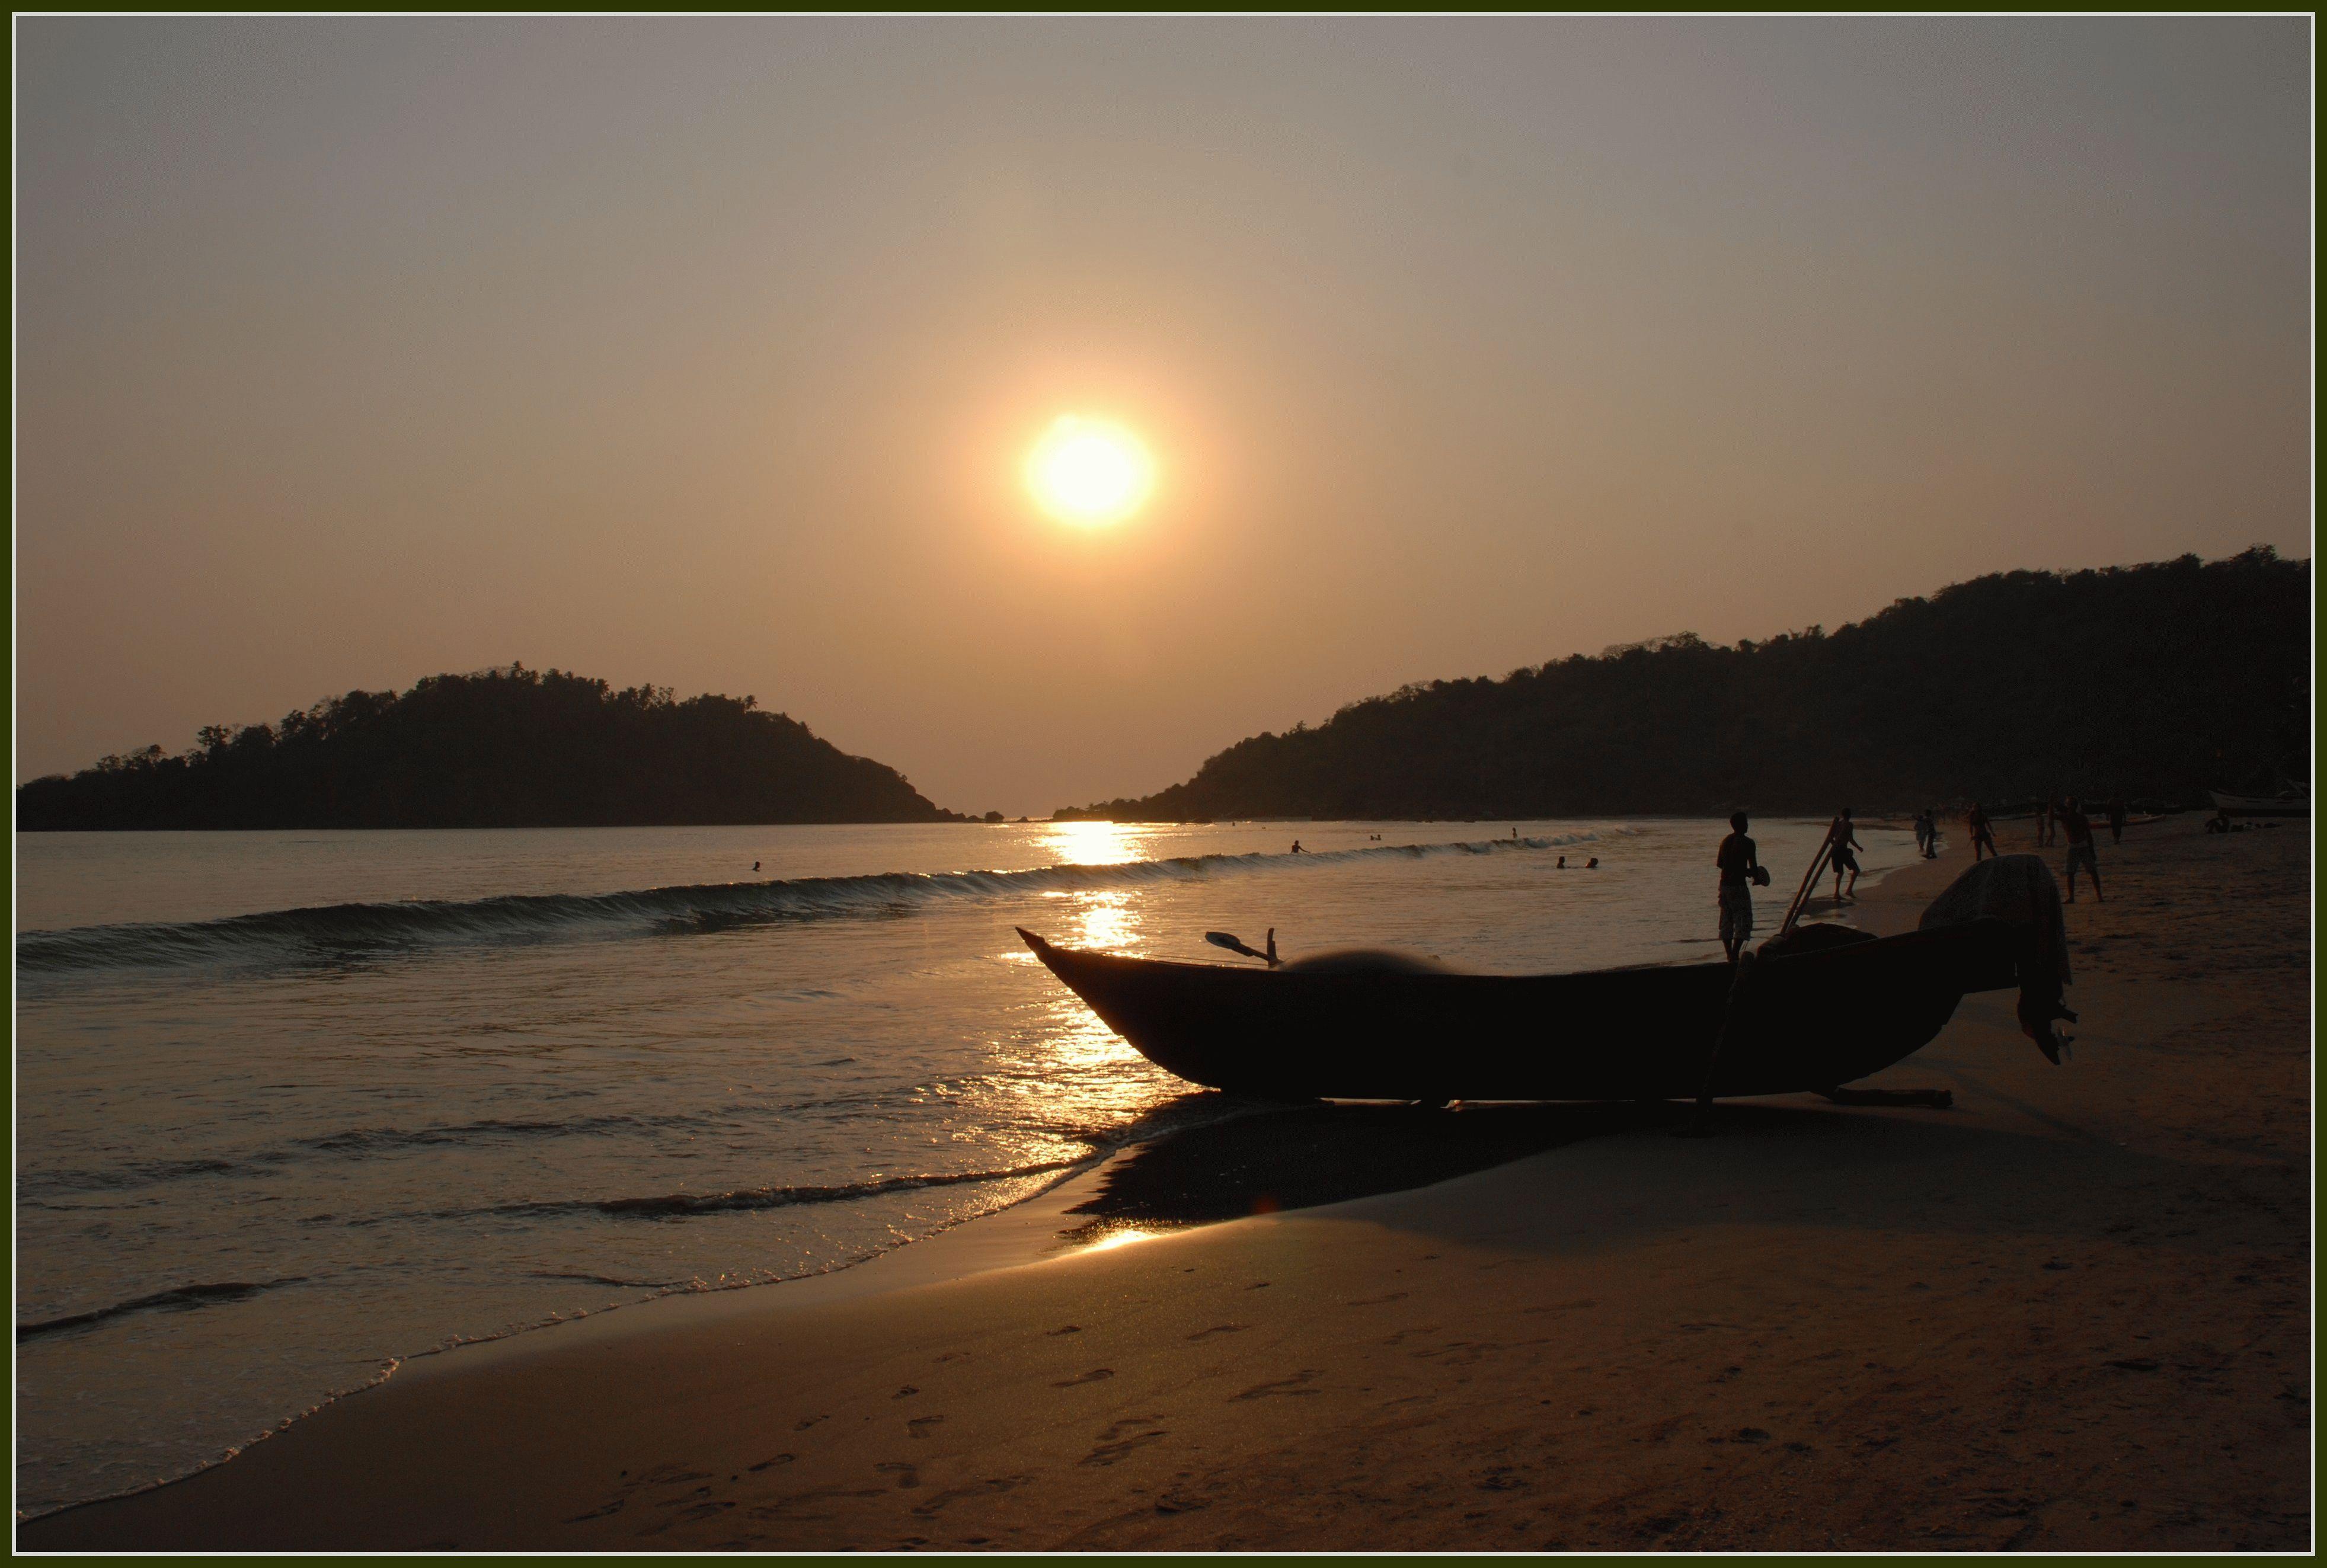 Пляжи Палолема (Palolem Beach), Гоа, Индия (15 фото видео)